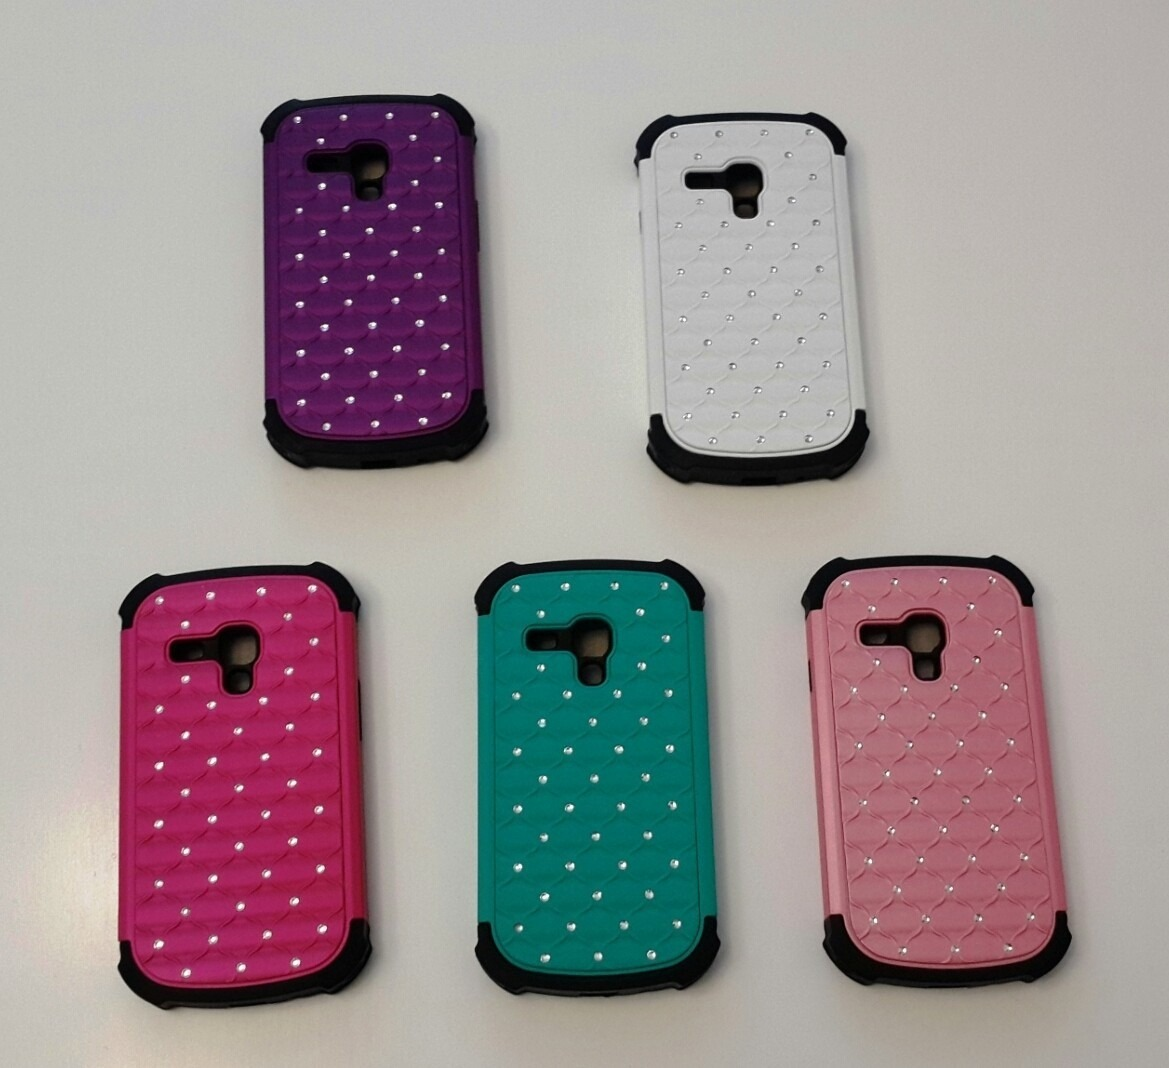 Forros samsung galaxy s3 y s3 mini celular estuche funda bs en mercado libre - Samsung s3 mini fundas ...